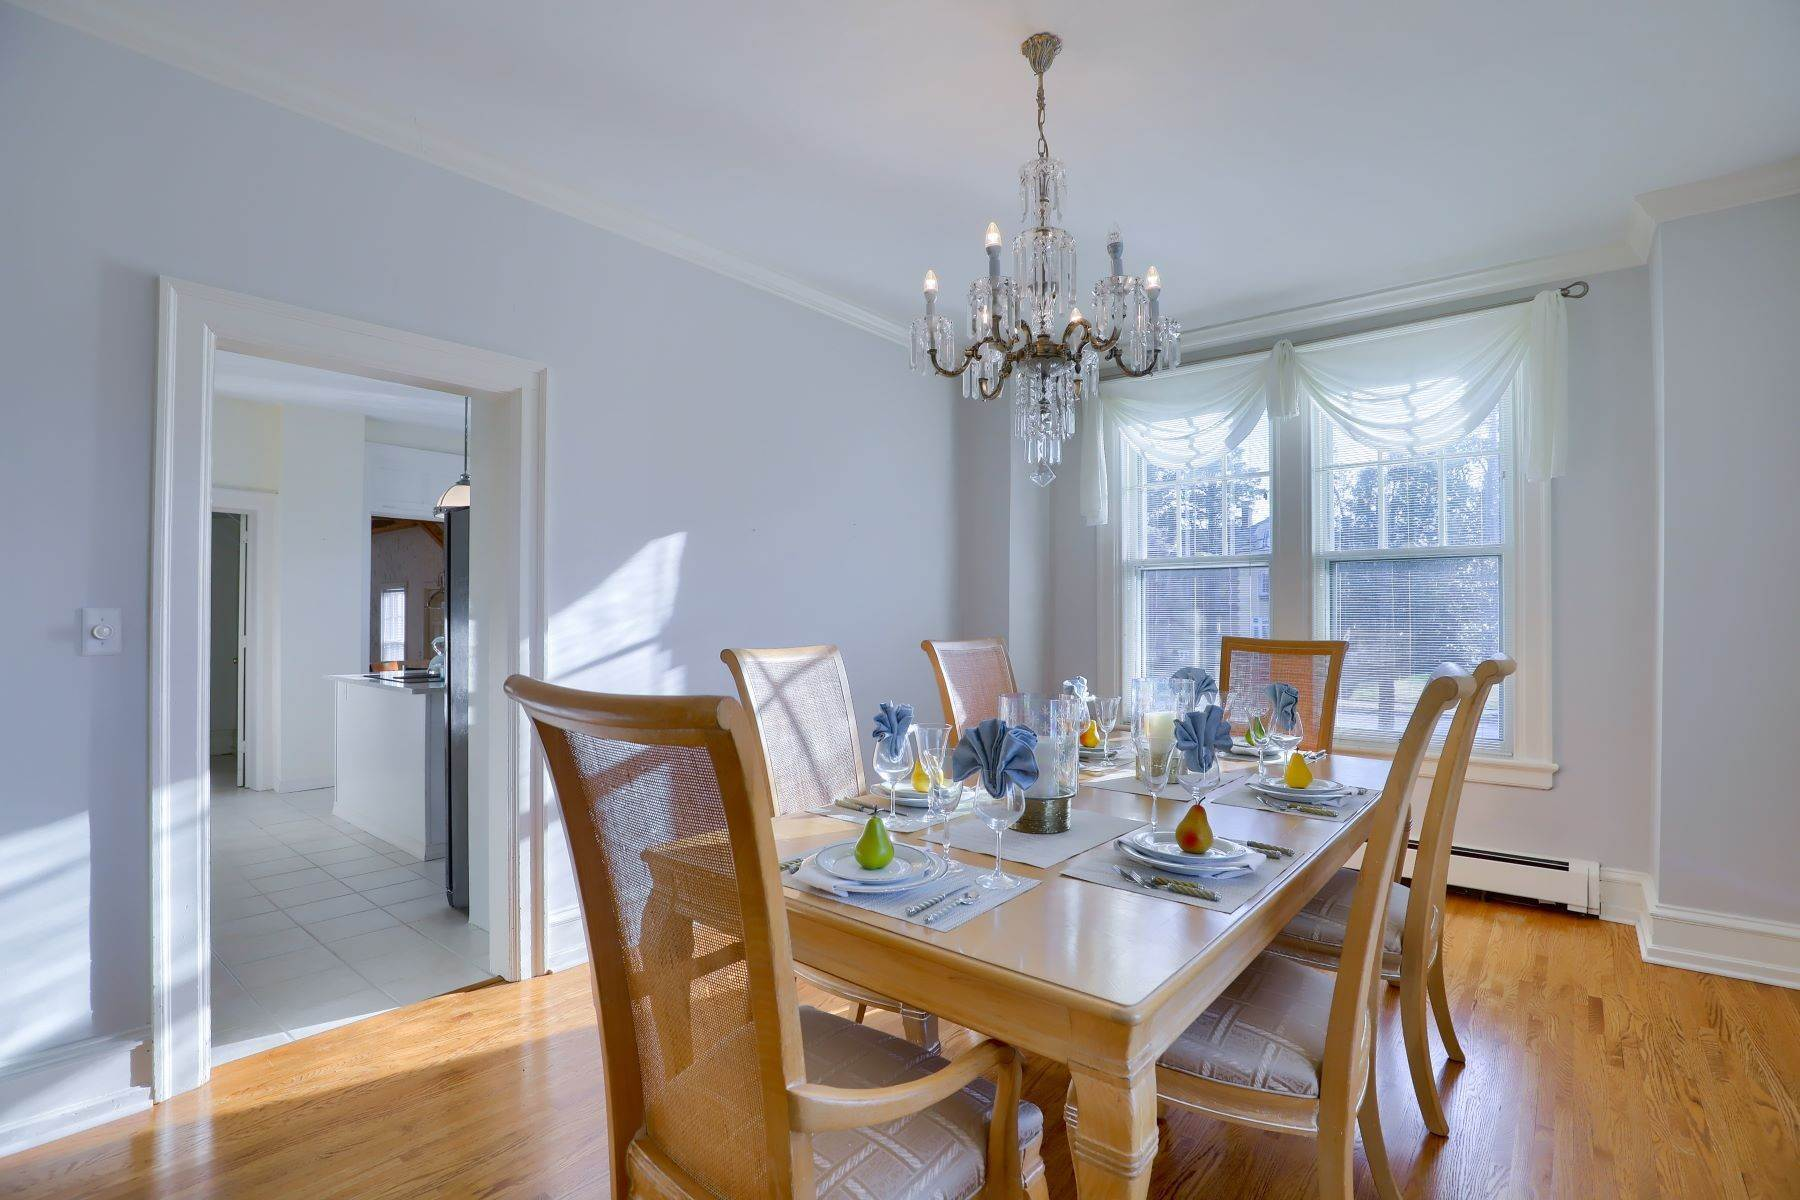 5. Single Family Homes for Sale at 206 E Granada Ave Hershey, Pennsylvania 17033 United States